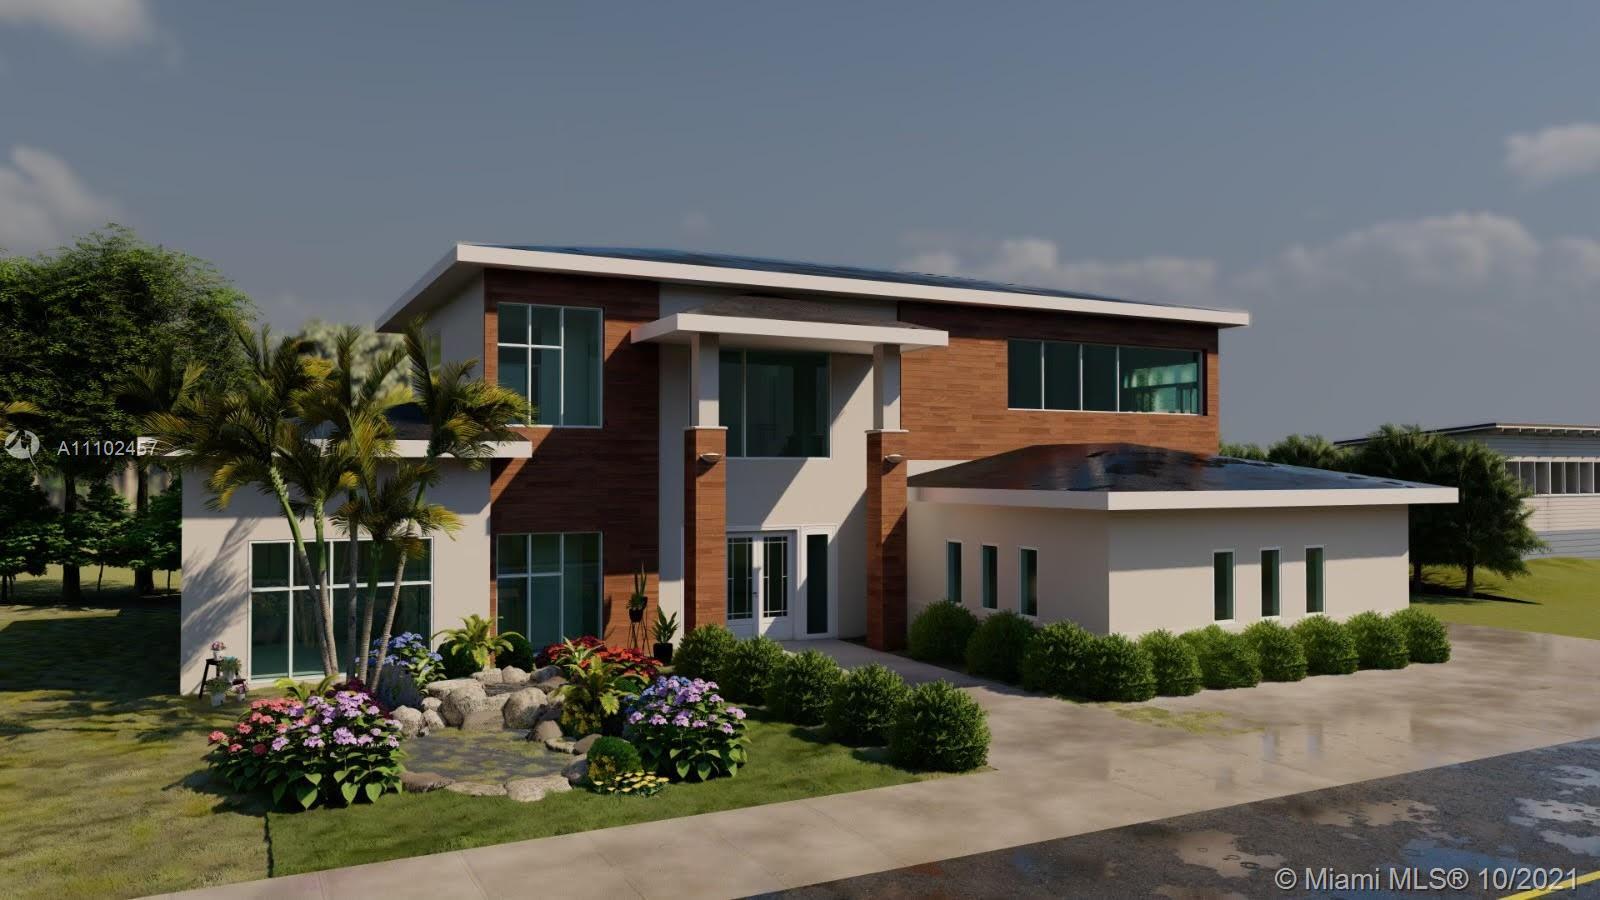 Single Family Home For Sale BARGER ESTATES1,986 Sqft